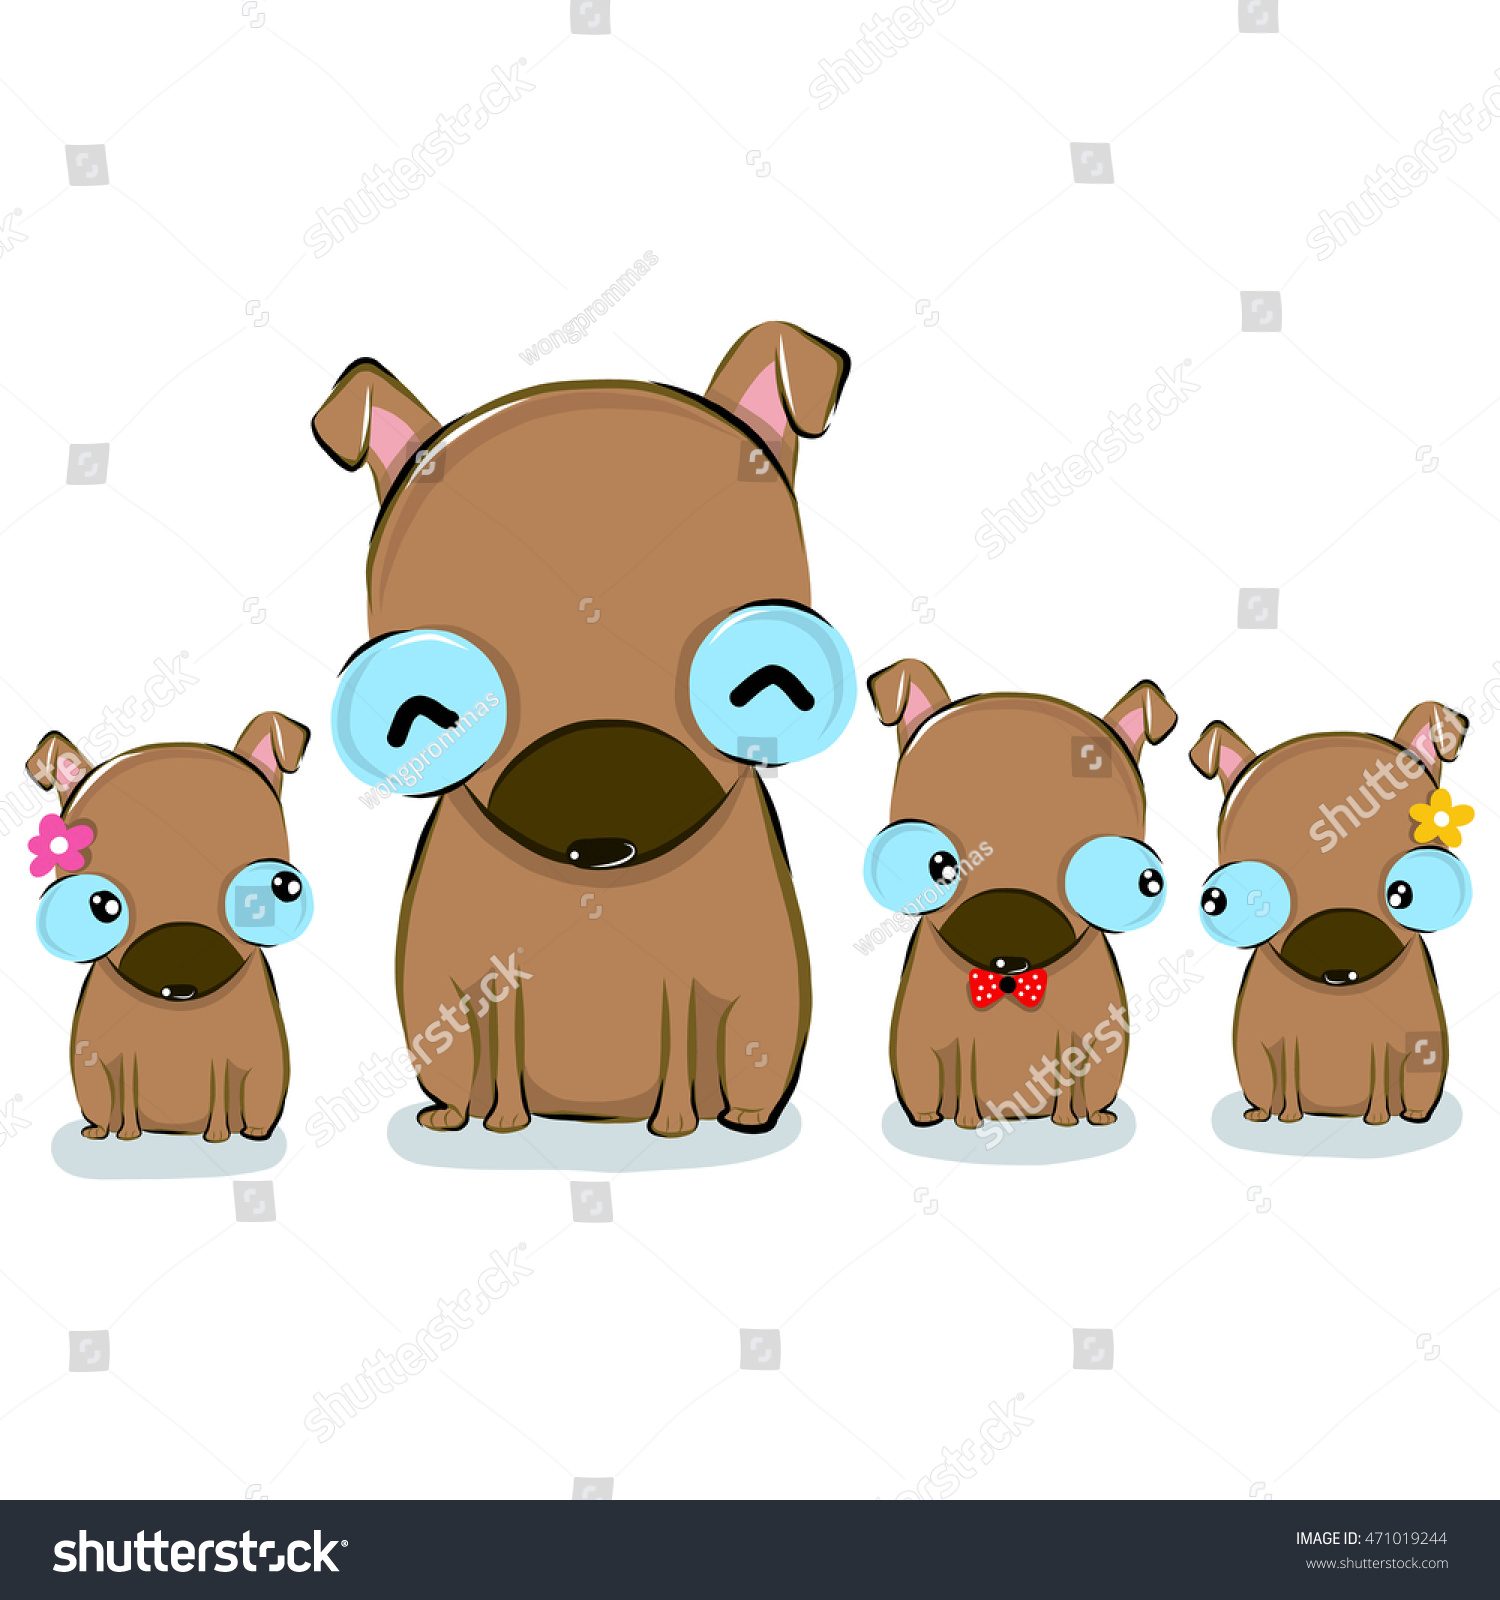 Vector Illustration Cute Cutethaidogfamily Cartoon Drawing Stock